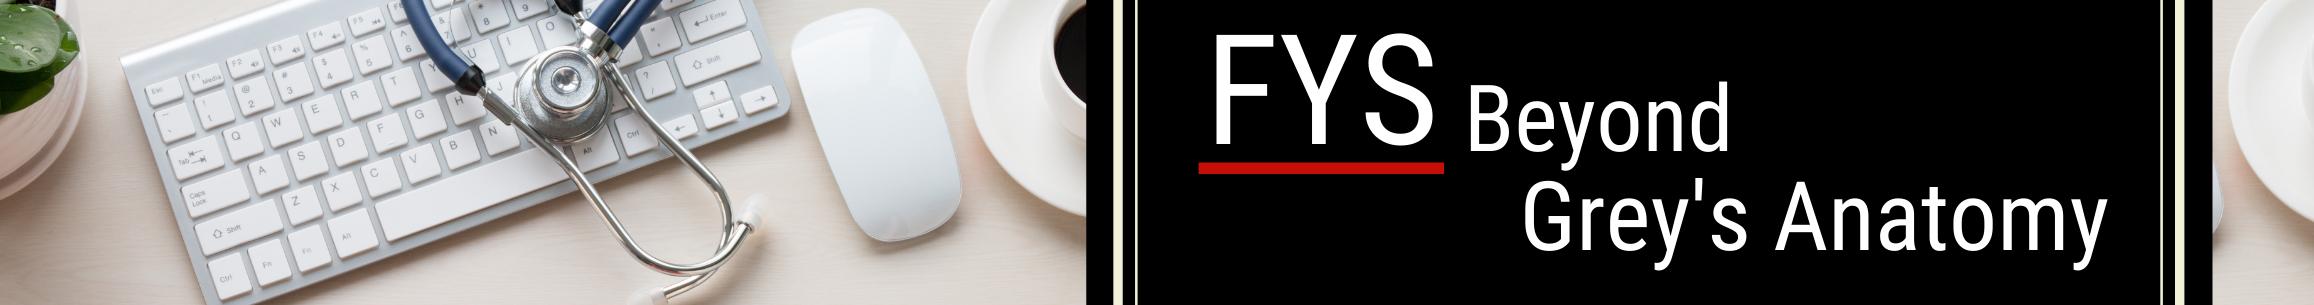 FYS Beyond Grey's Anatomy